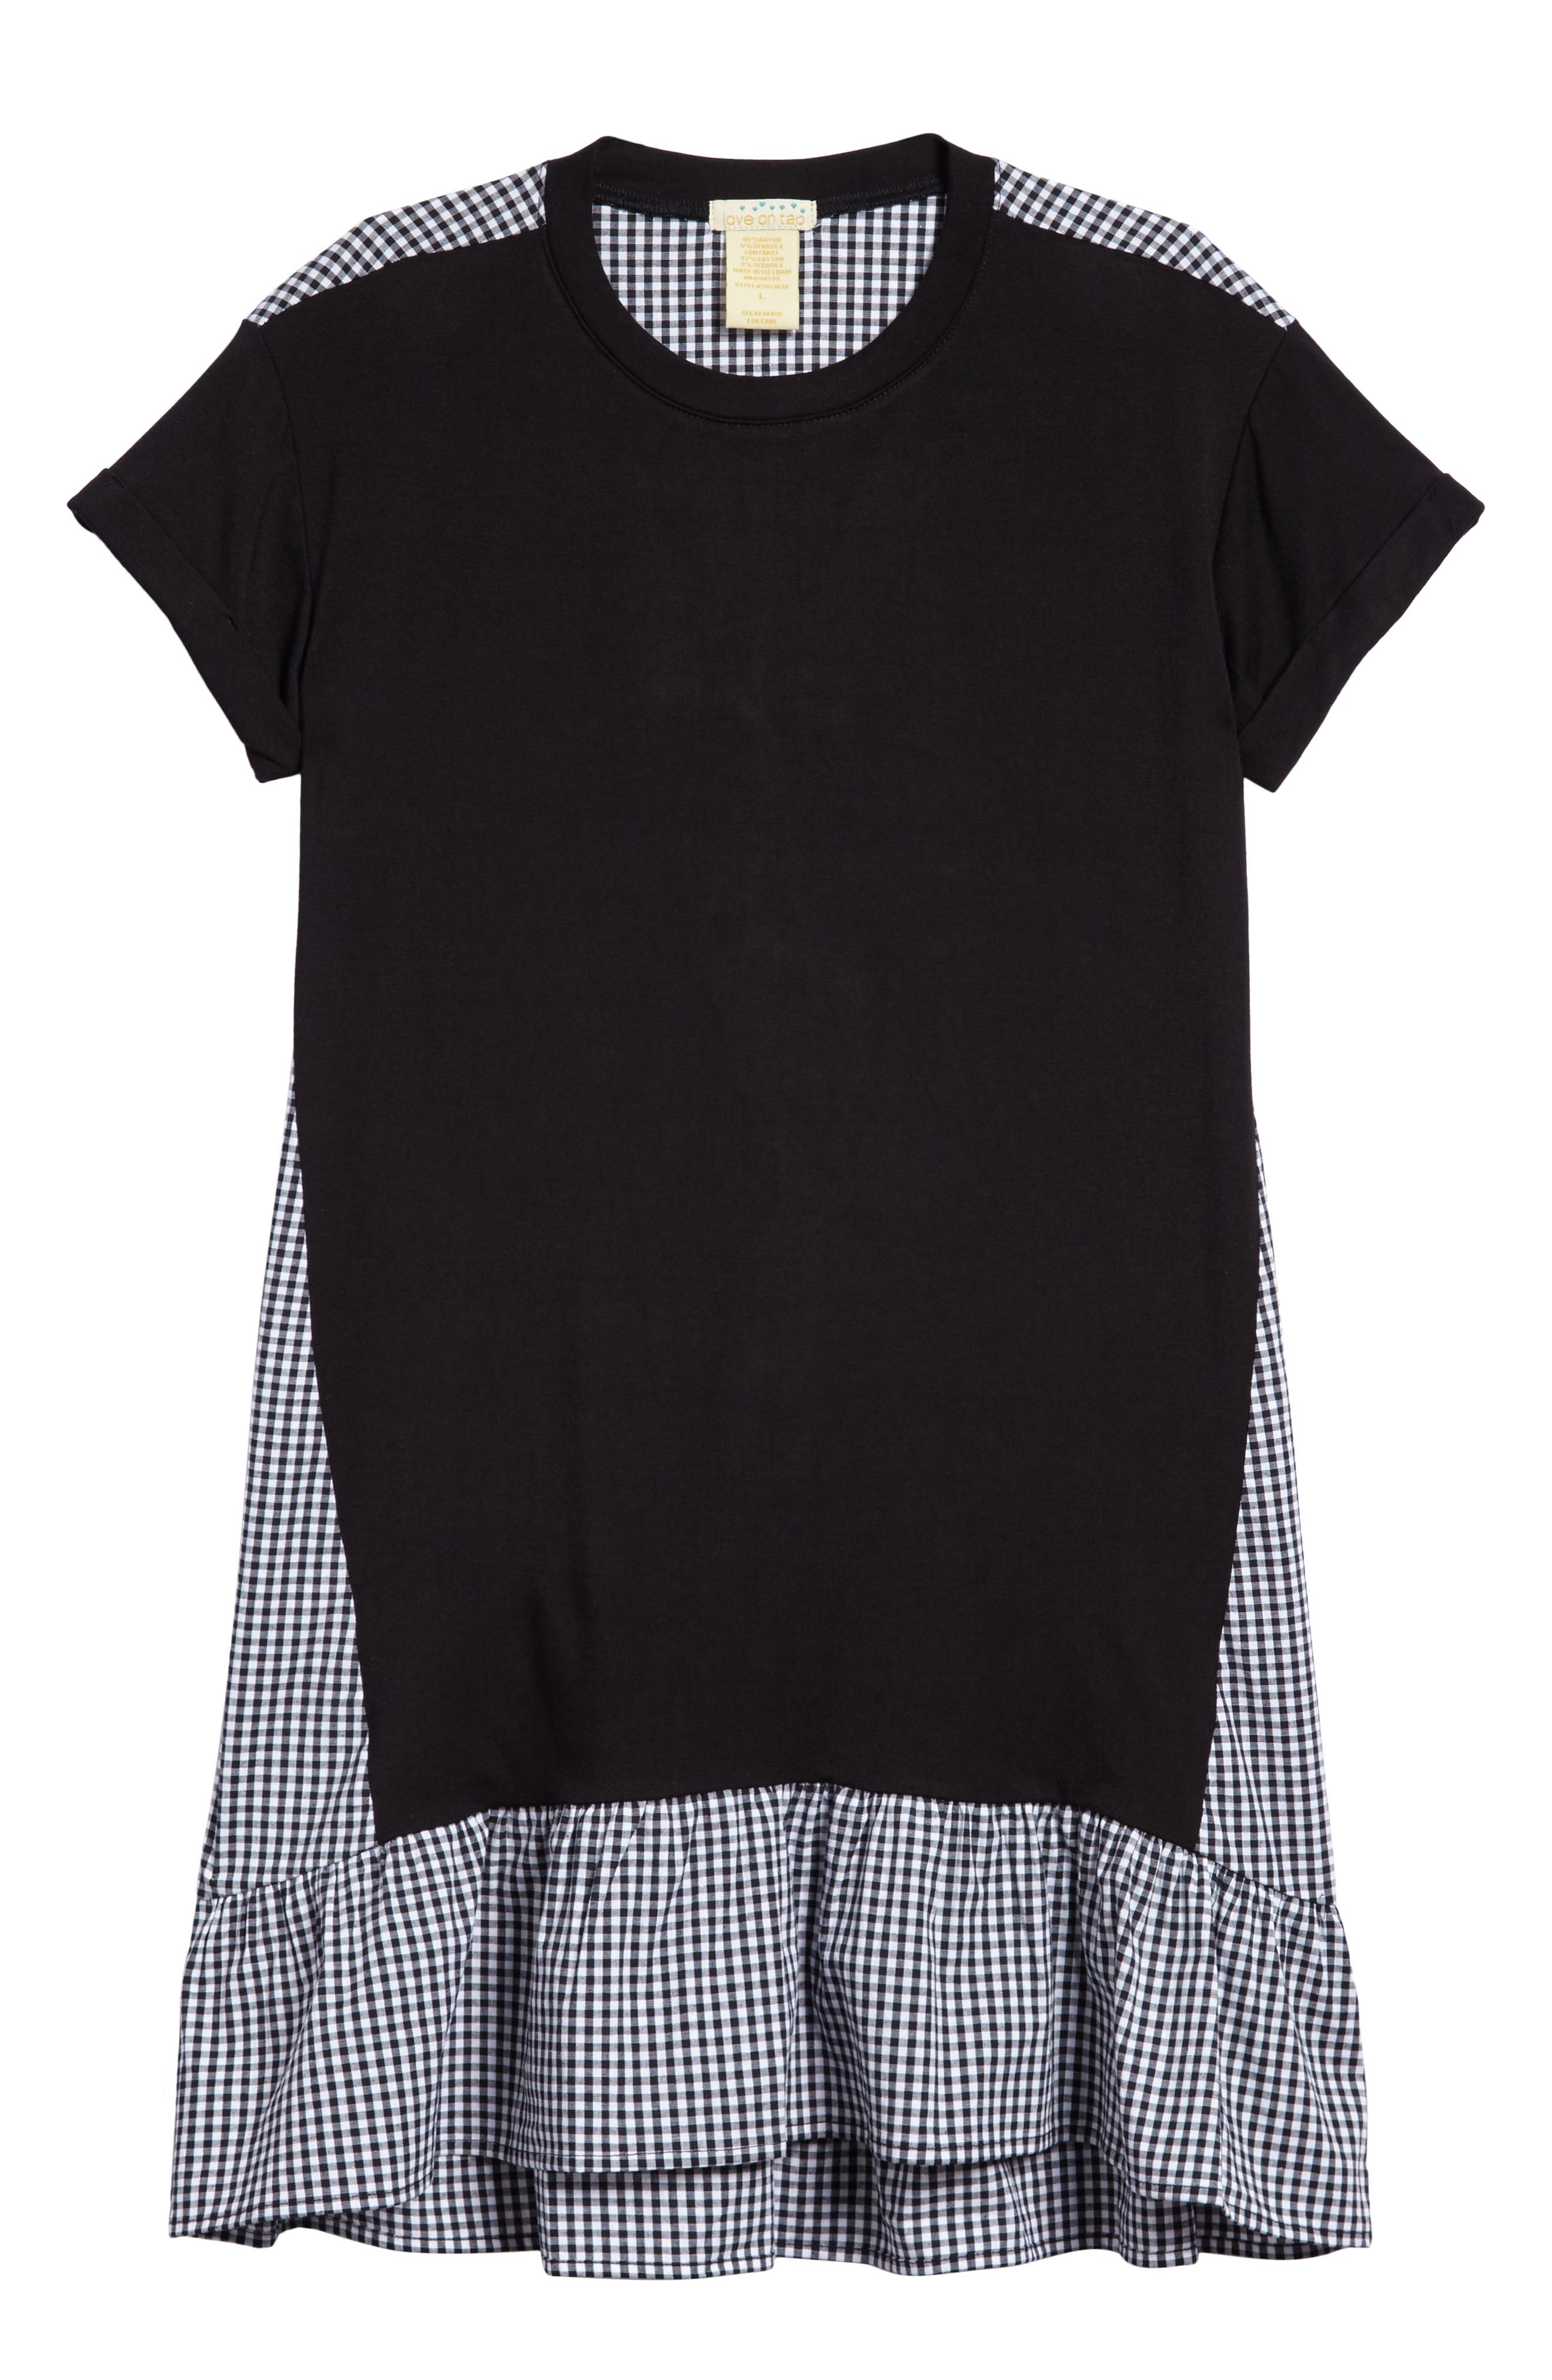 T-Shirt Dress,                             Main thumbnail 1, color,                             001